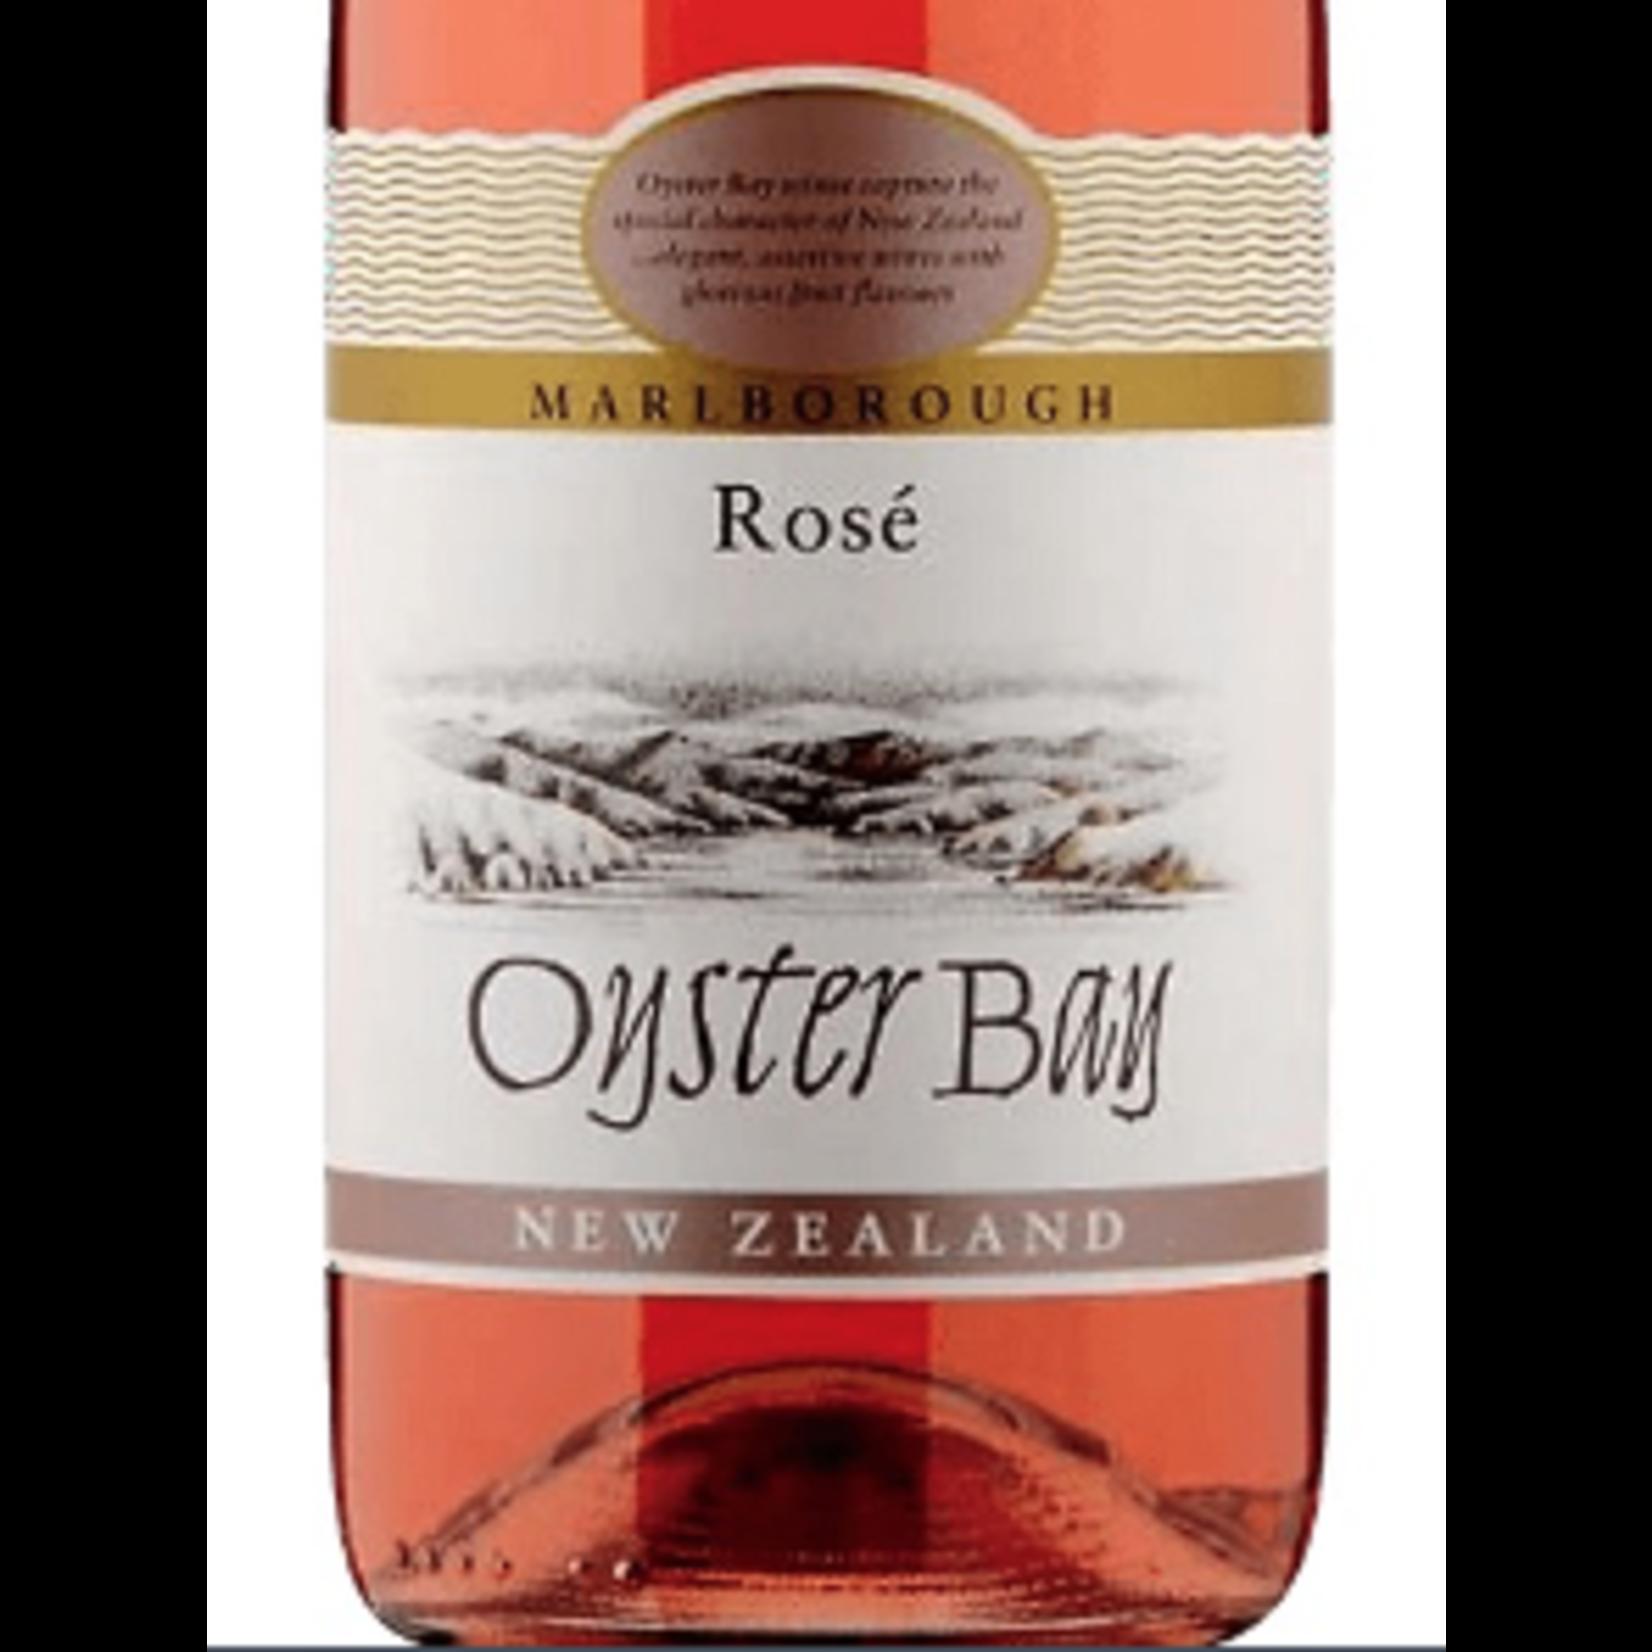 Oyster Bay Wines Oyster Bay Rose 2020 Marlborough, New Zealand